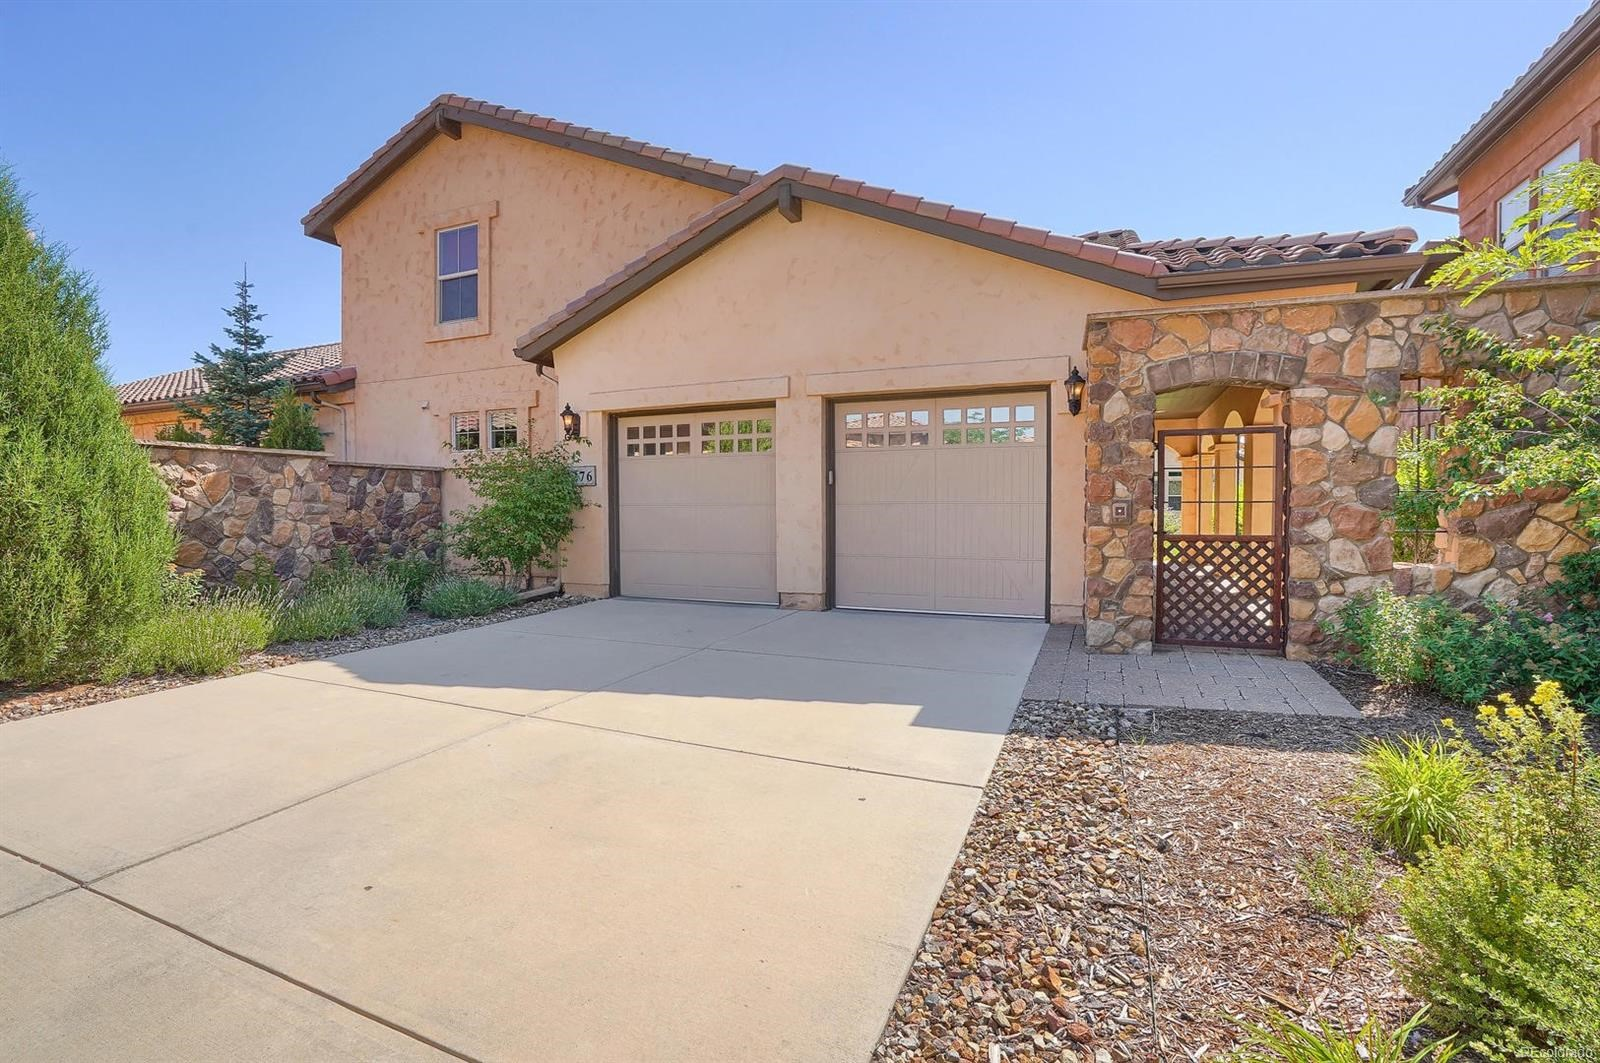 MLS# 7383029 - 5 - 2276 Rocking Horse Court, Colorado Springs, CO 80921